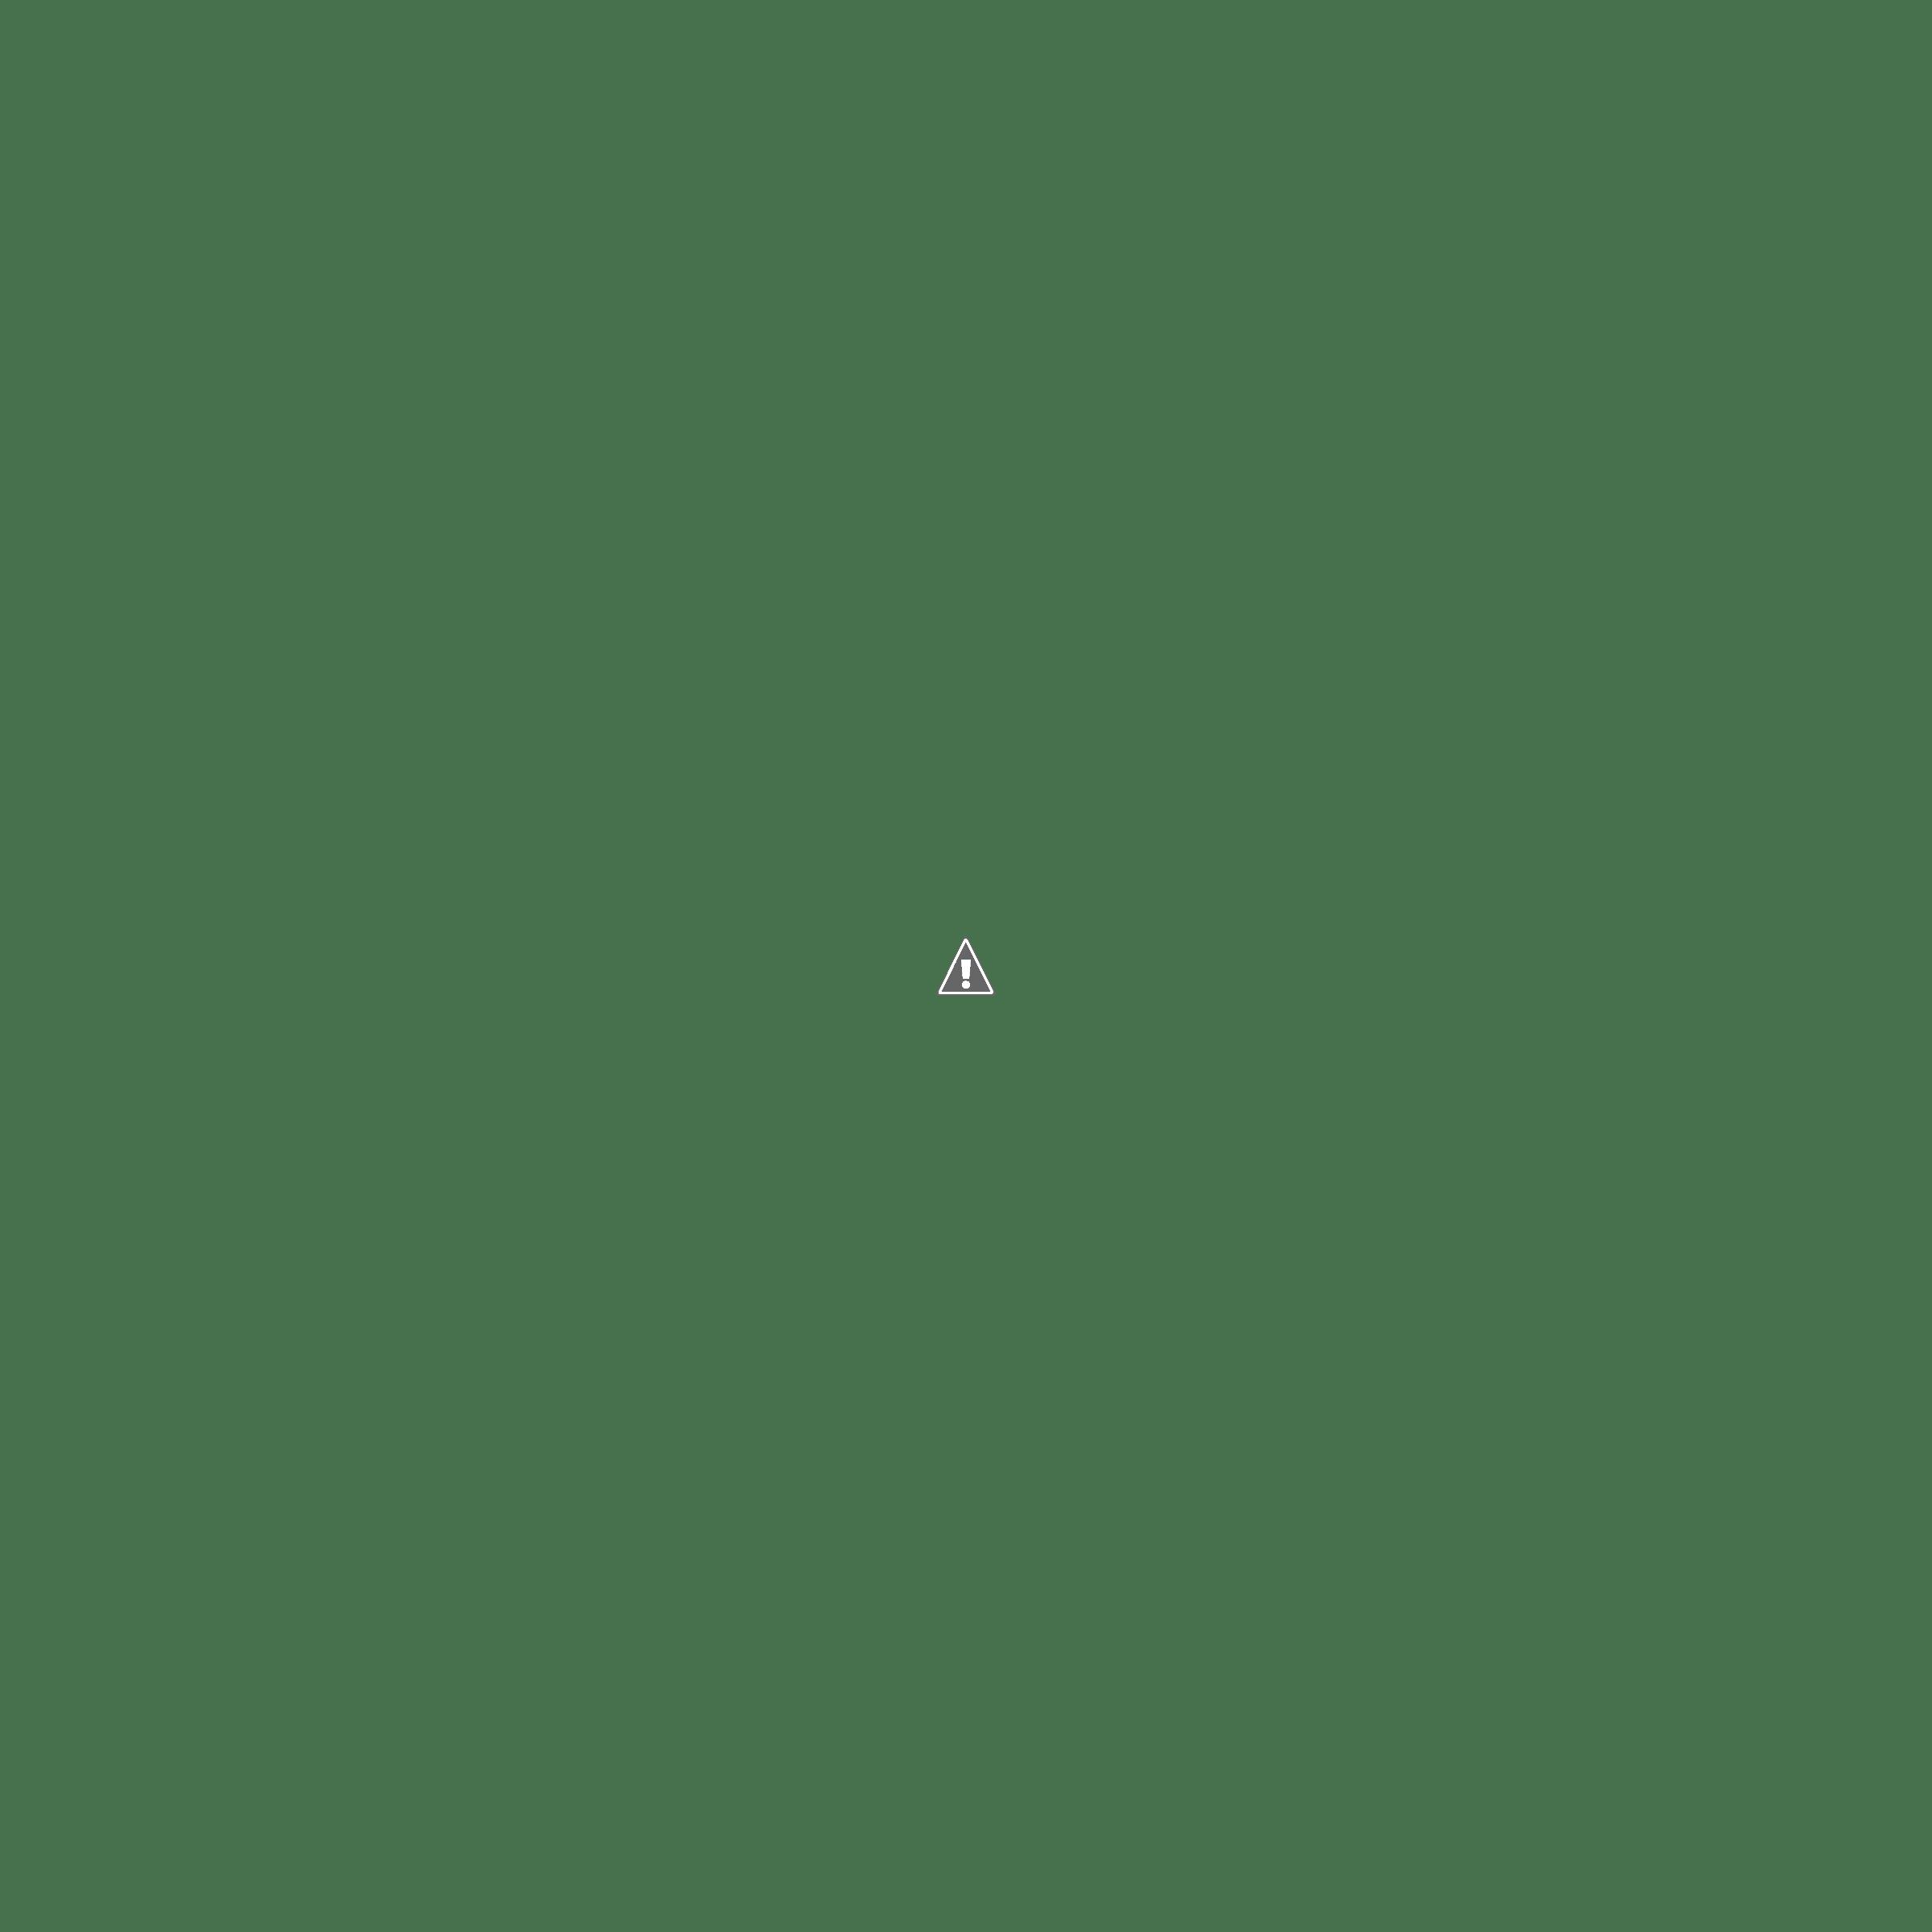 Fatima Homes, Marikina Heights, Marikina City site development plan